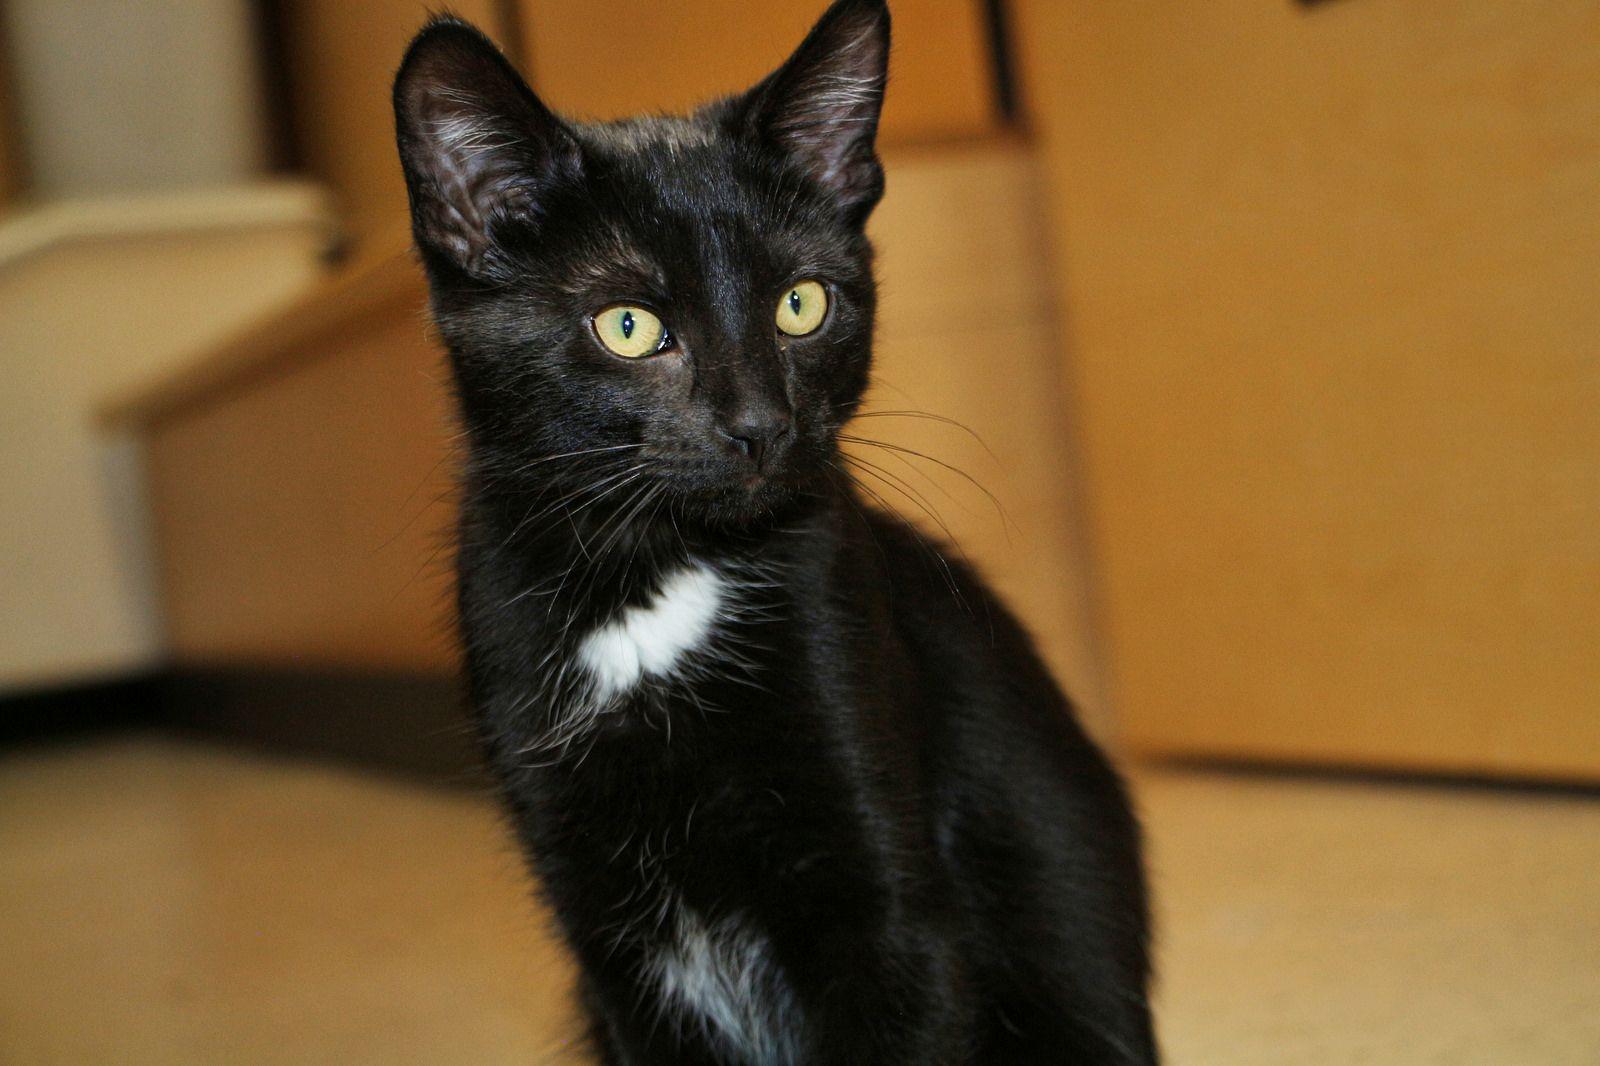 Pansy Scat Petsmart Adoption Centre June 6 2016 Cat Adoption Petsmart Cat Photo